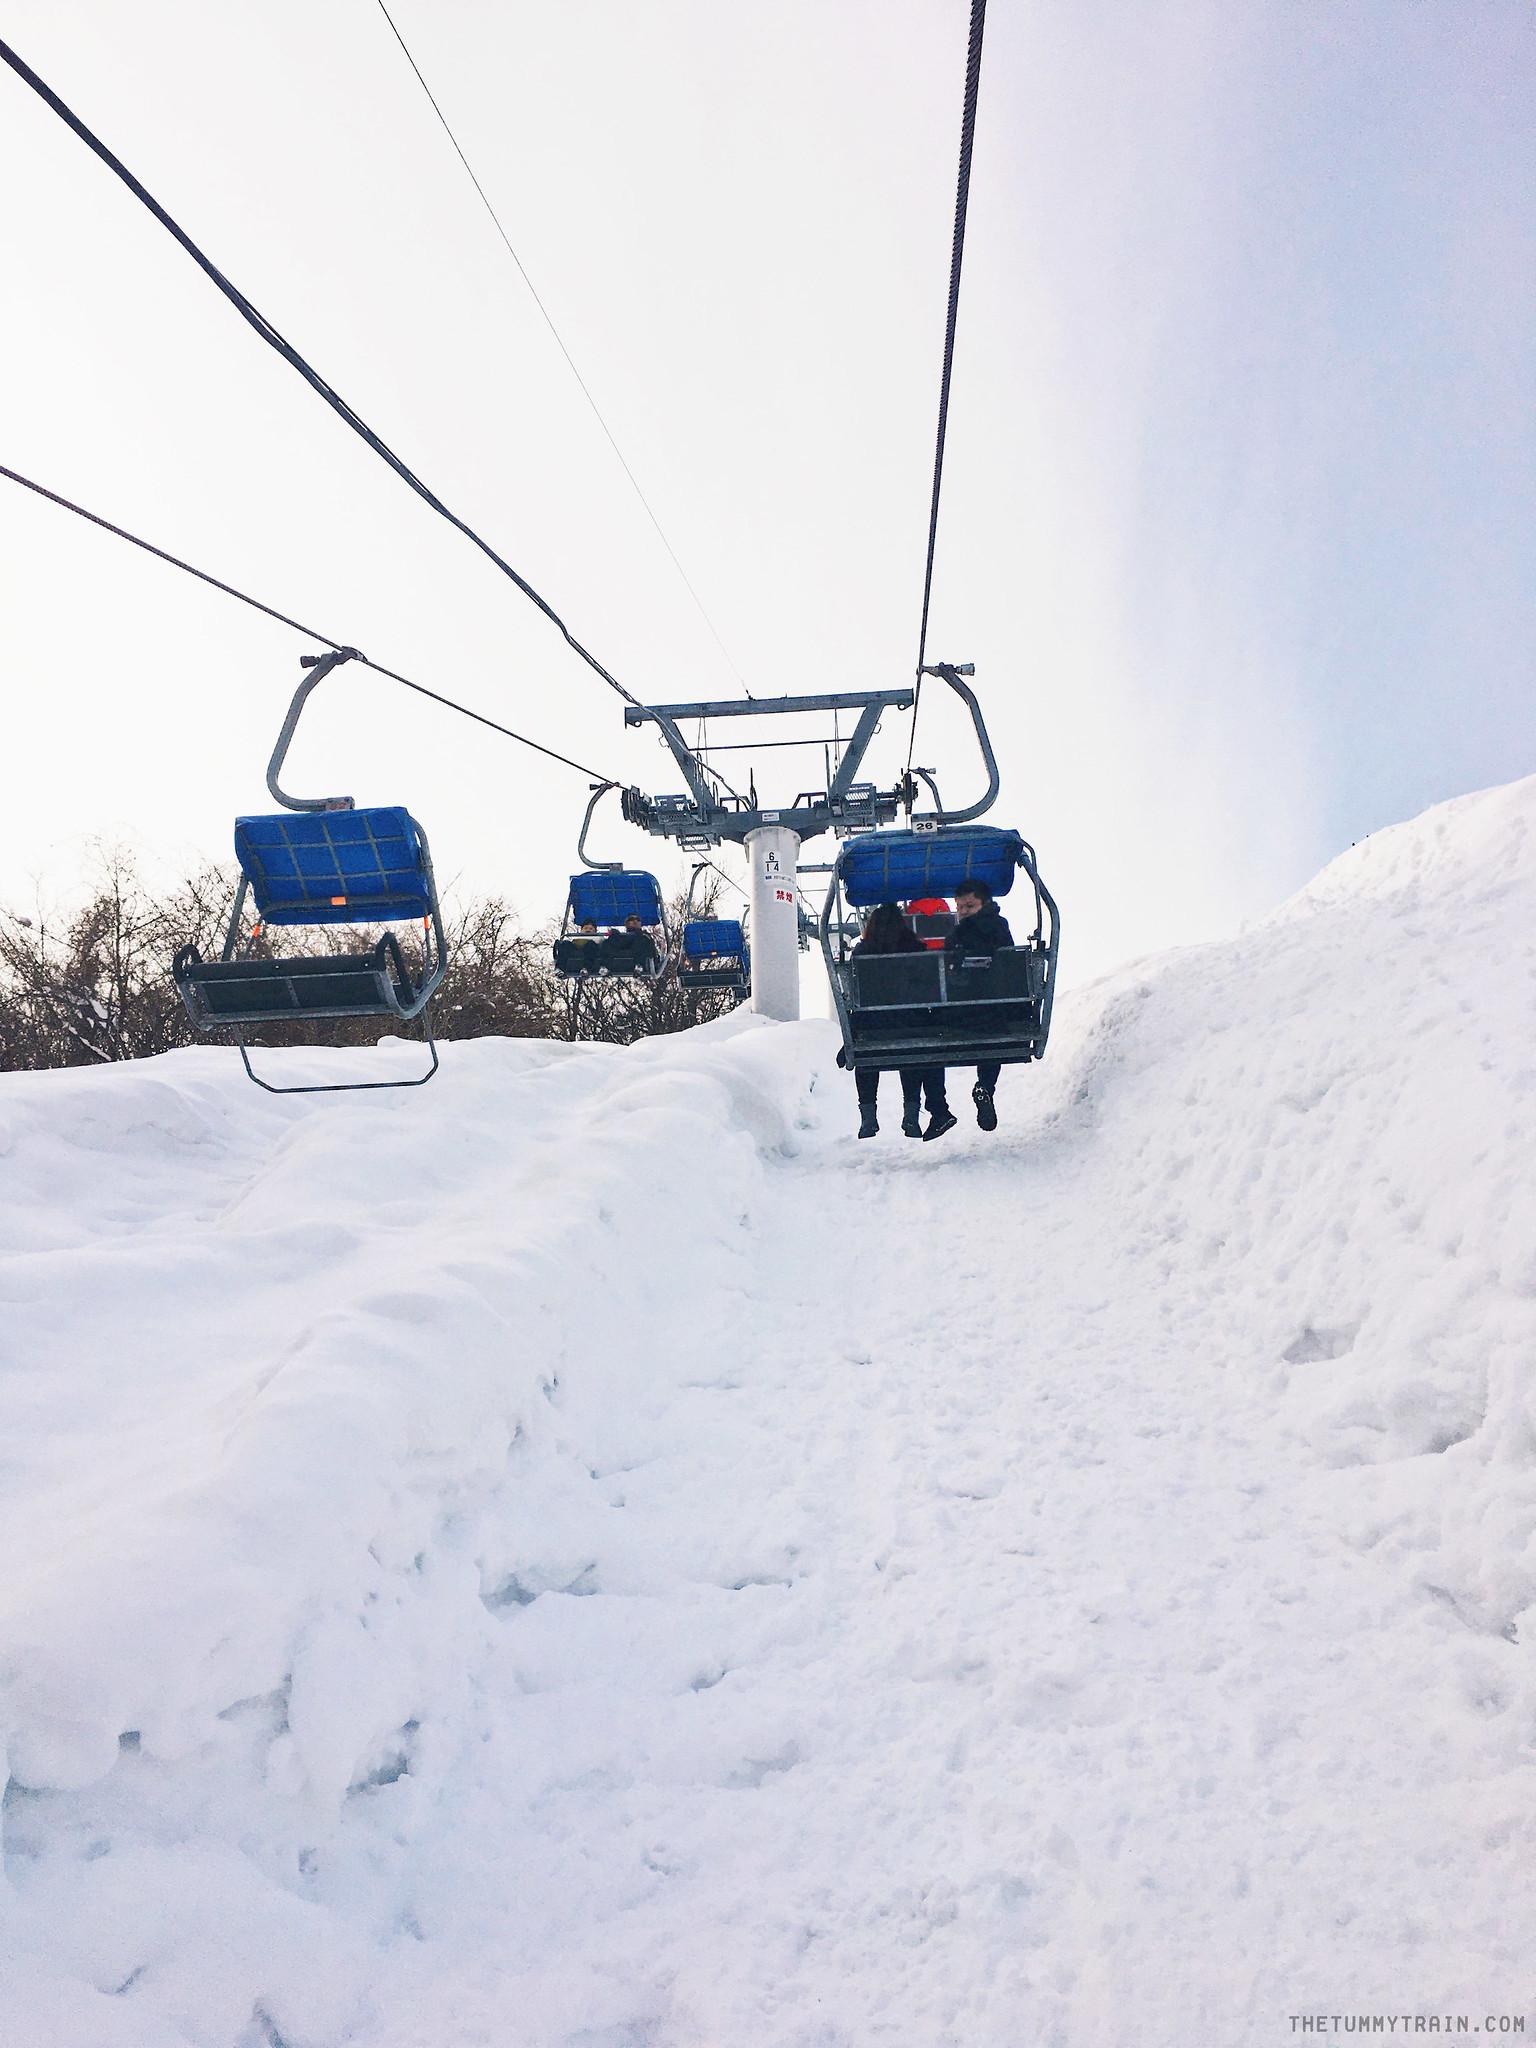 32101948663 4655b15829 k - Sapporo Travel Diary 2017: Lifting off to the Okurayama Ski Jump Viewing Lounge